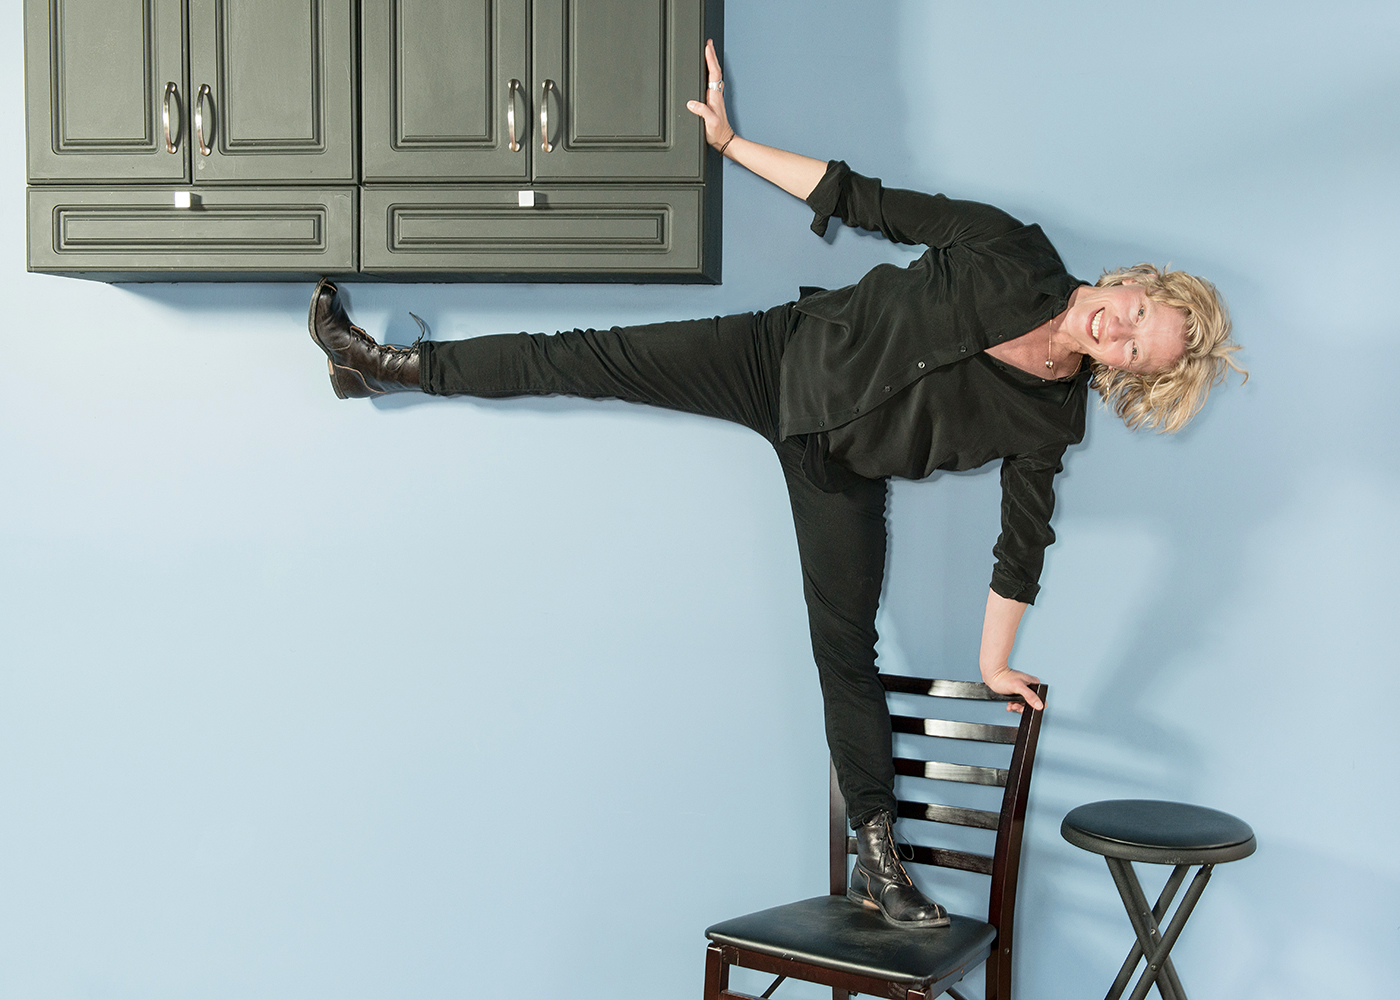 Julie Rothschild  Having fun   at her dance & movement studio.